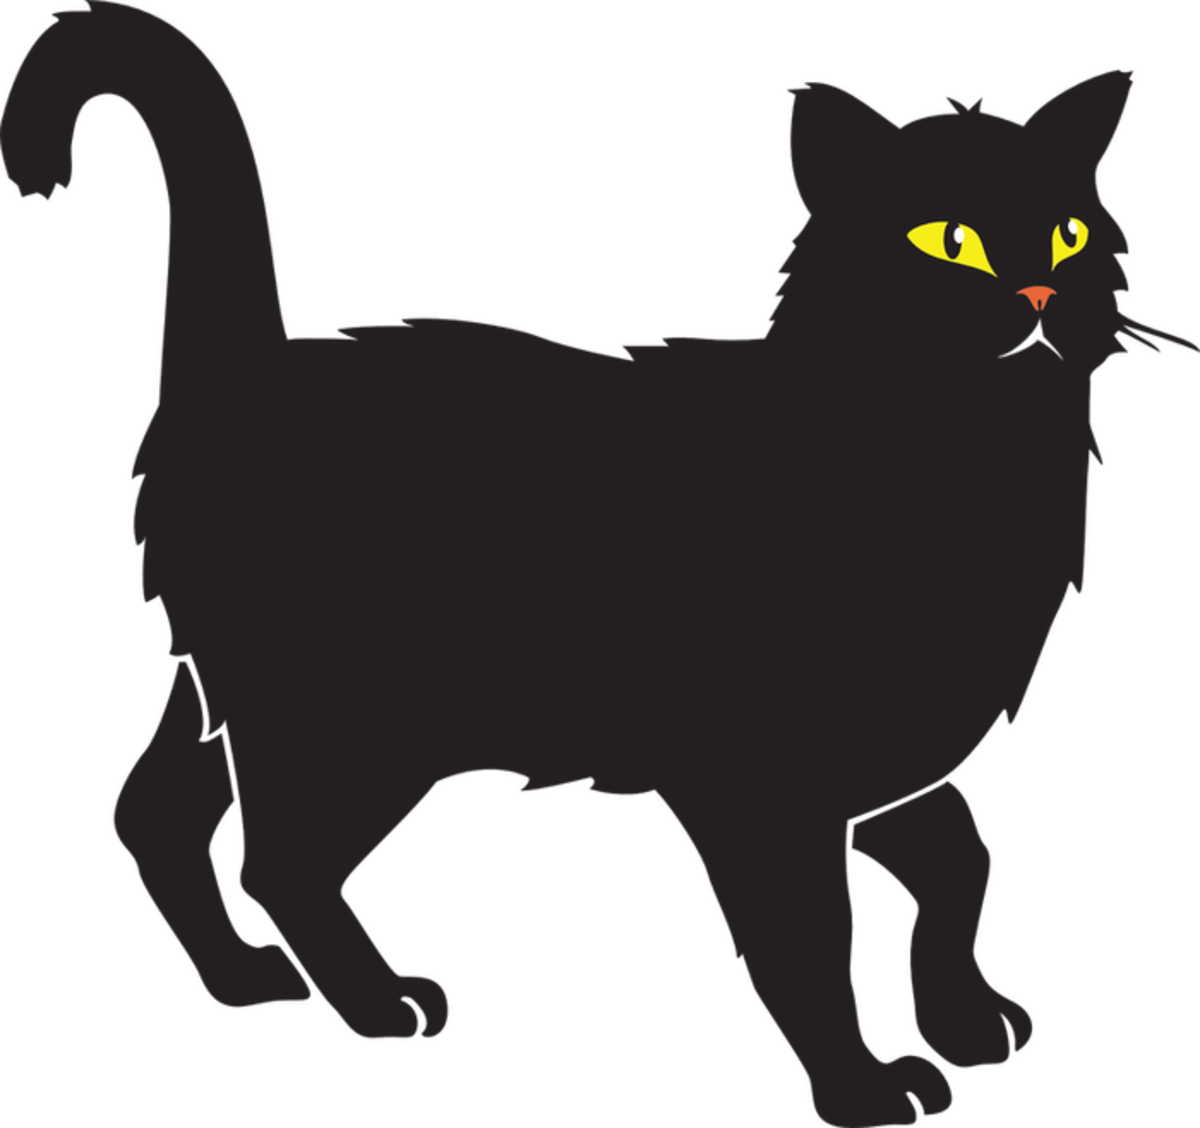 clipart halloween cat - photo #26